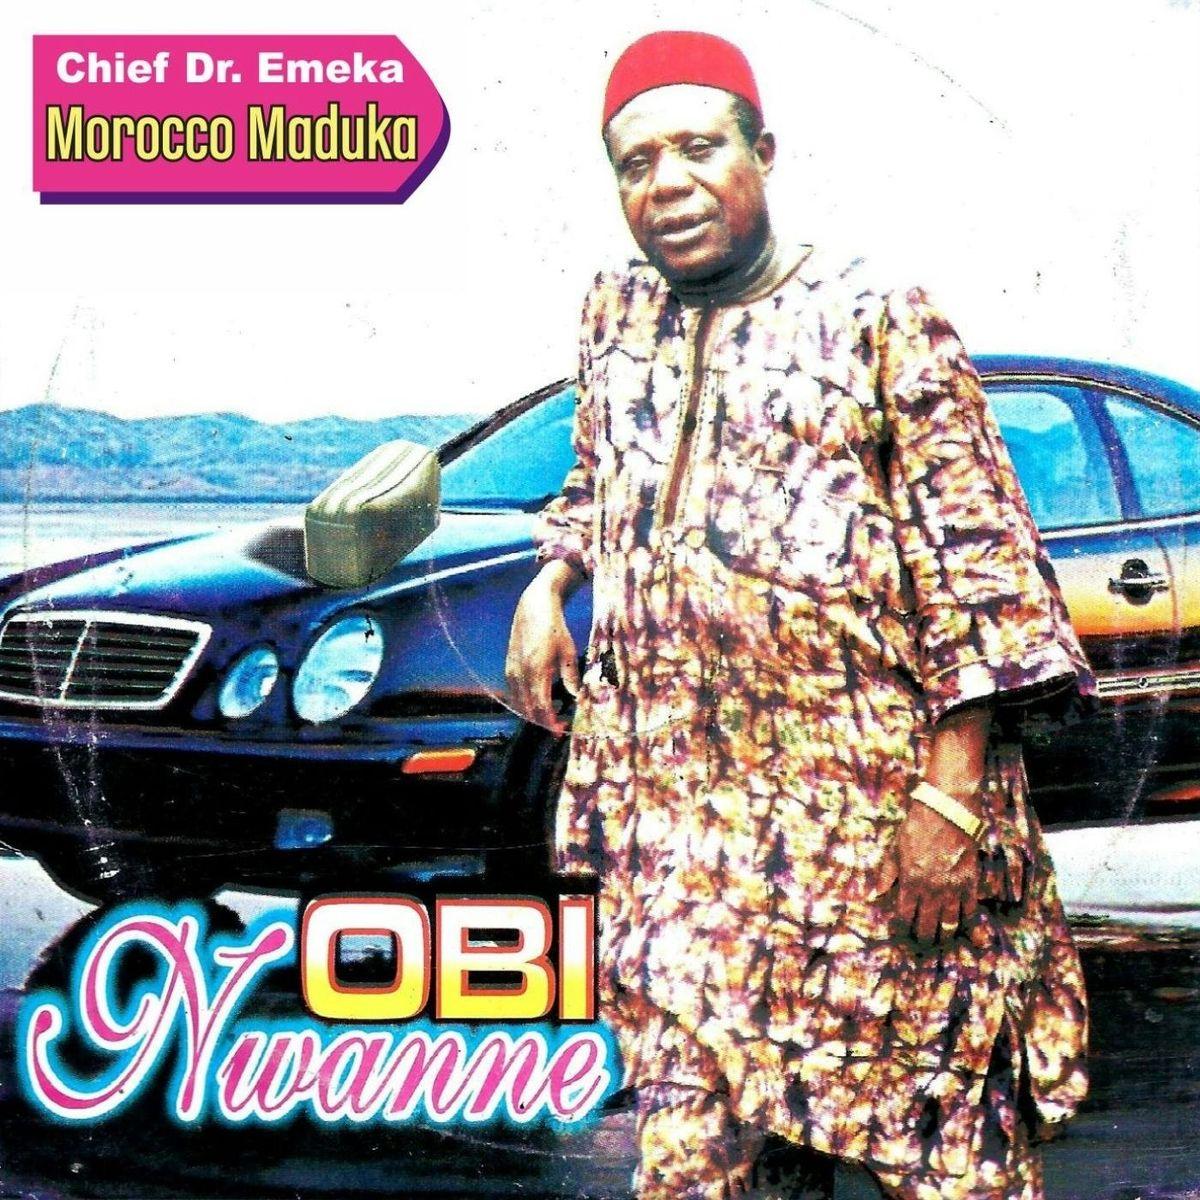 Chief Dr. Prince Emeka Morocco Maduka - Obi Nwanne (Part A & B) mp3 download